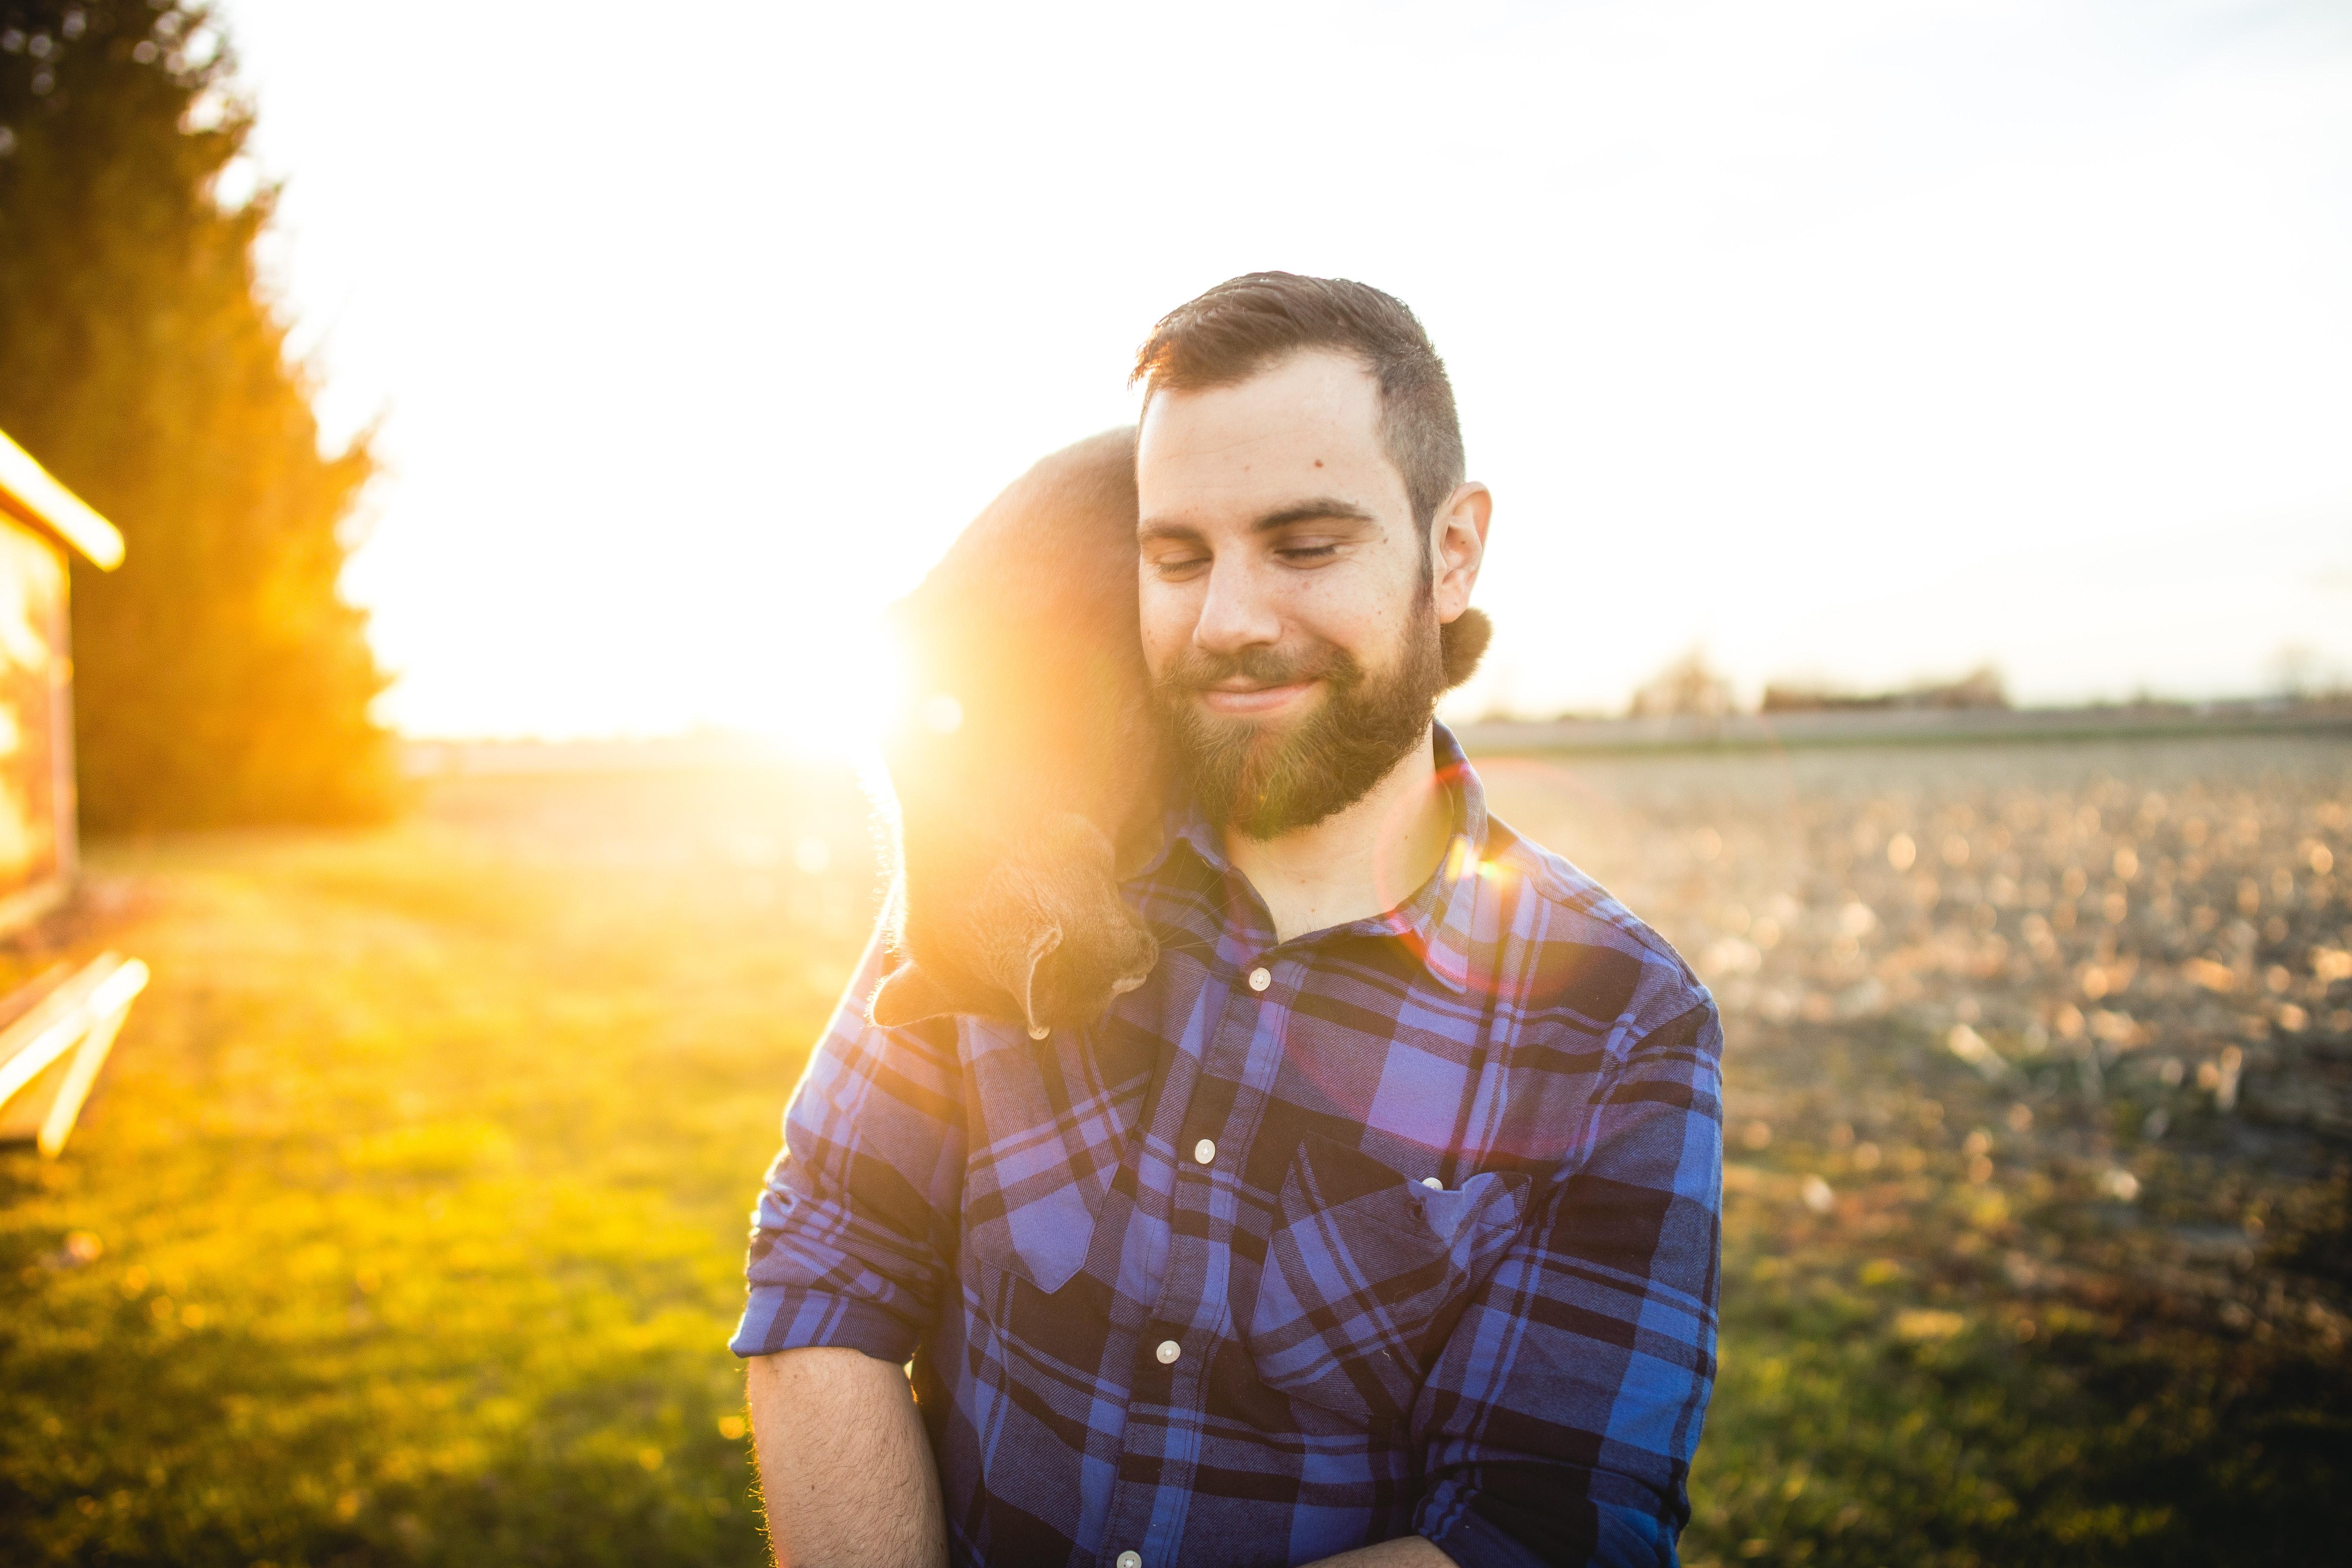 adult-beard-farmer-23876